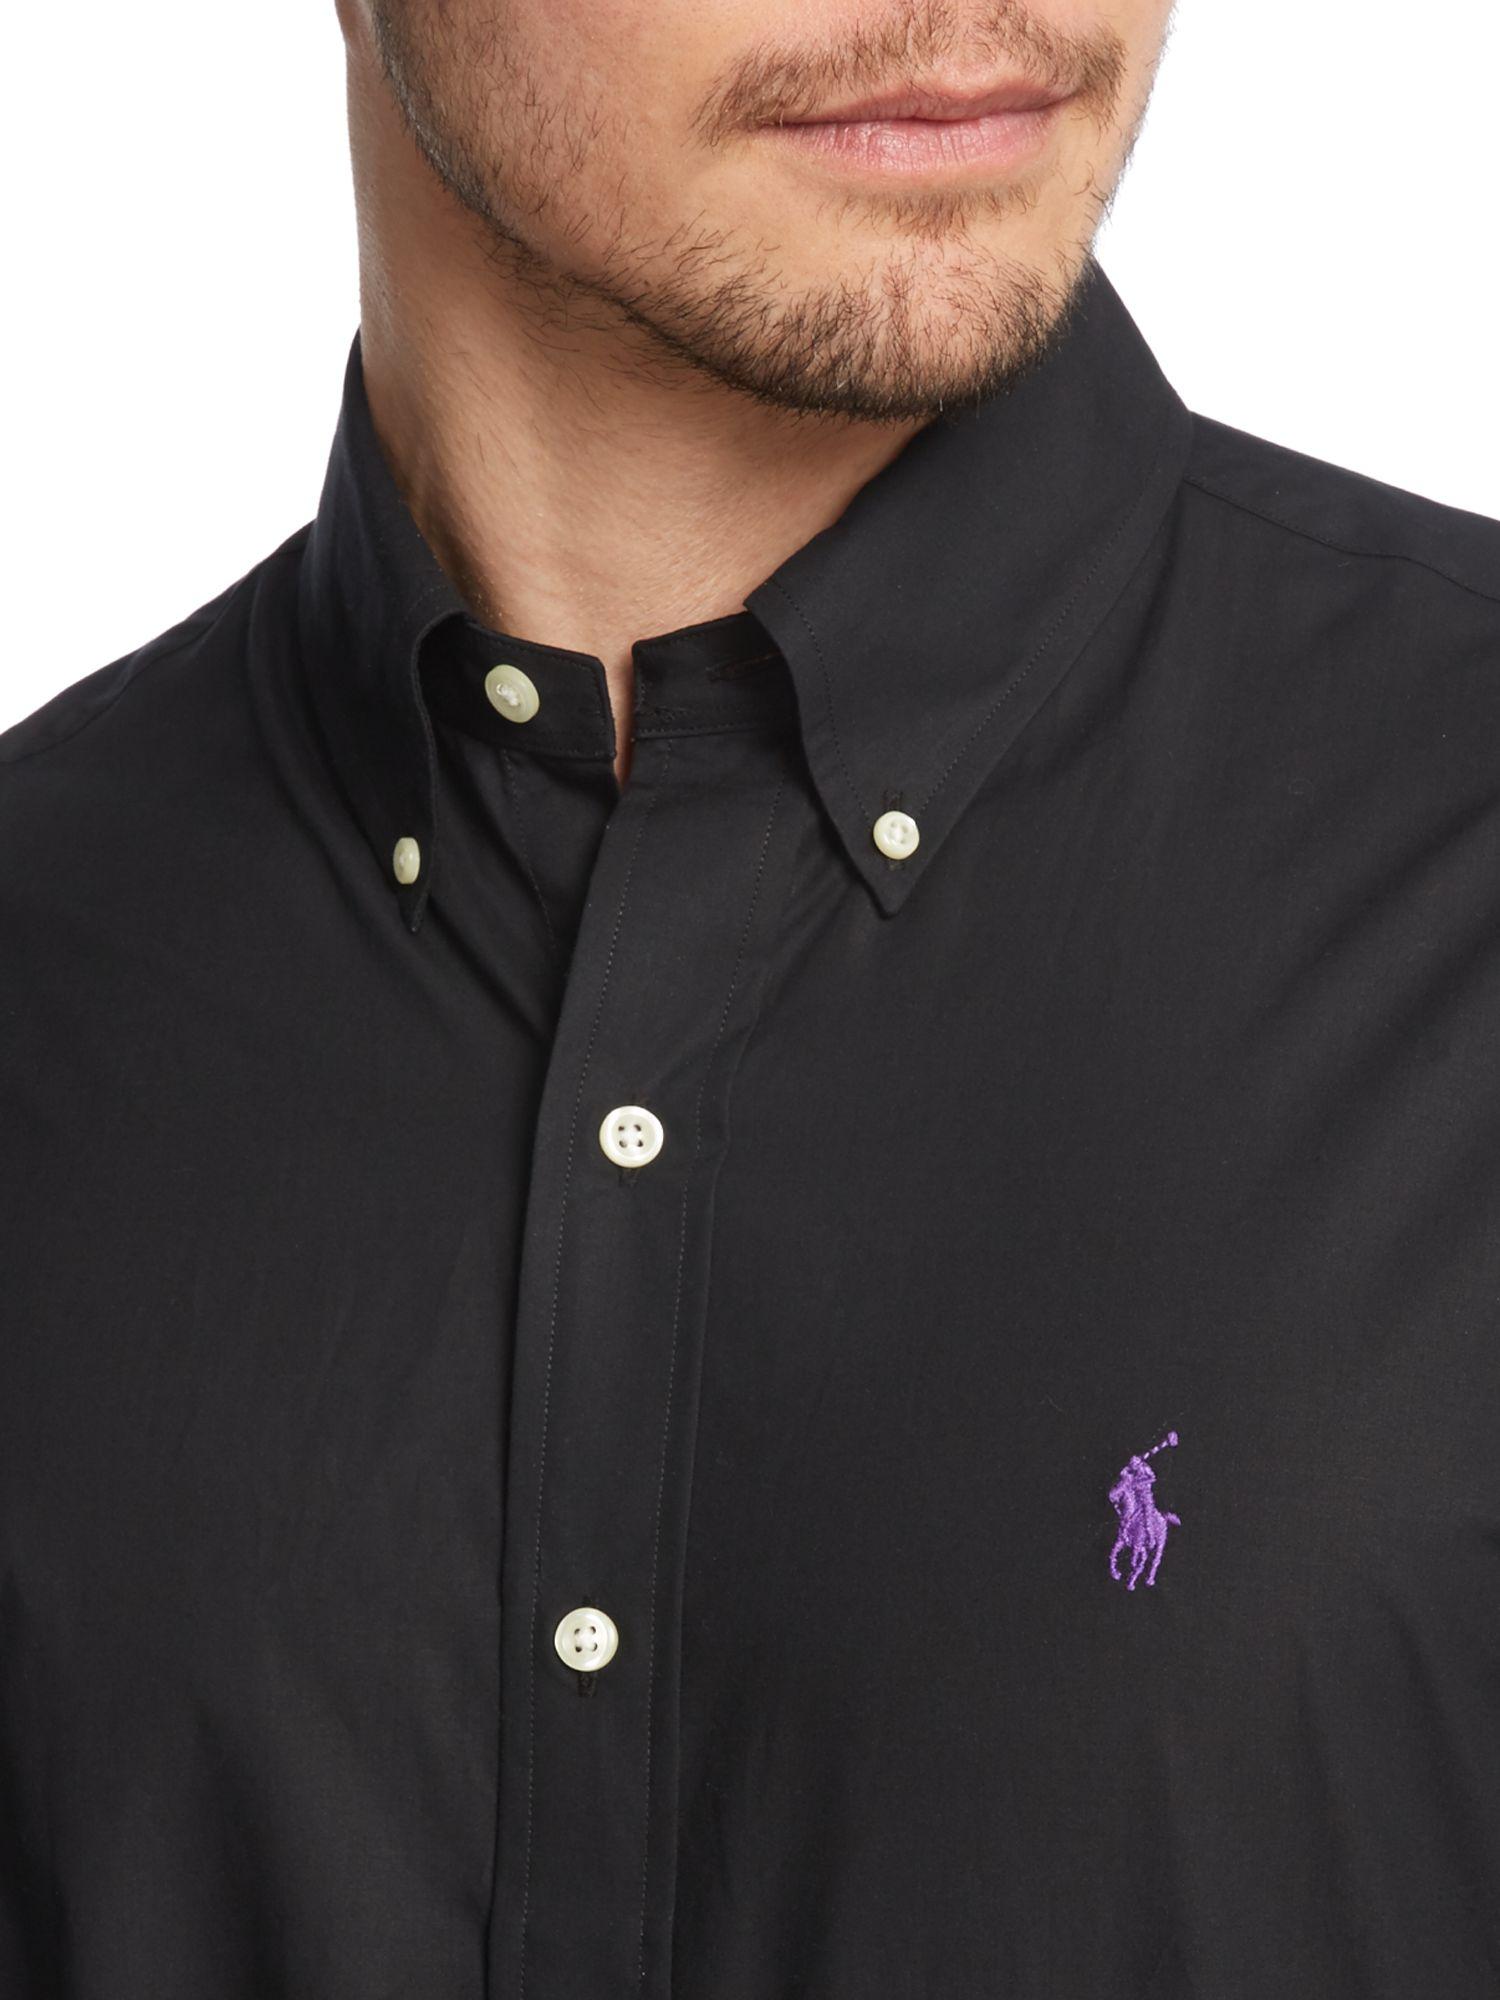 Polo ralph lauren Plain Long Sleeve Button Down Shirt in Black for ...